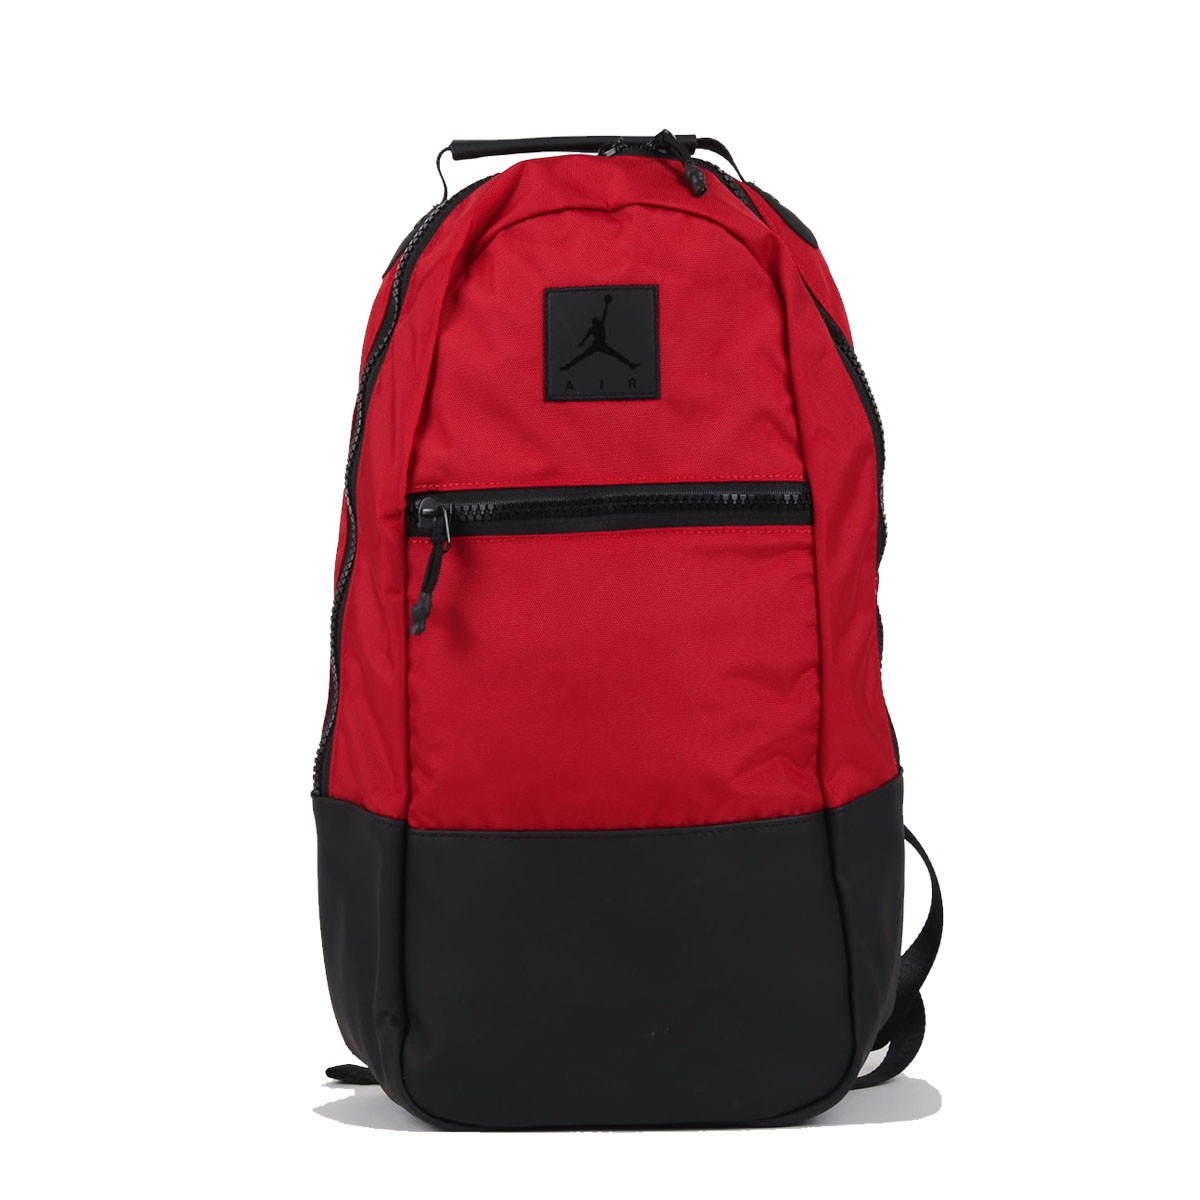 new arrival 08ab8 858d8 Jordan Collaborator Backpack Junior 'Bred'